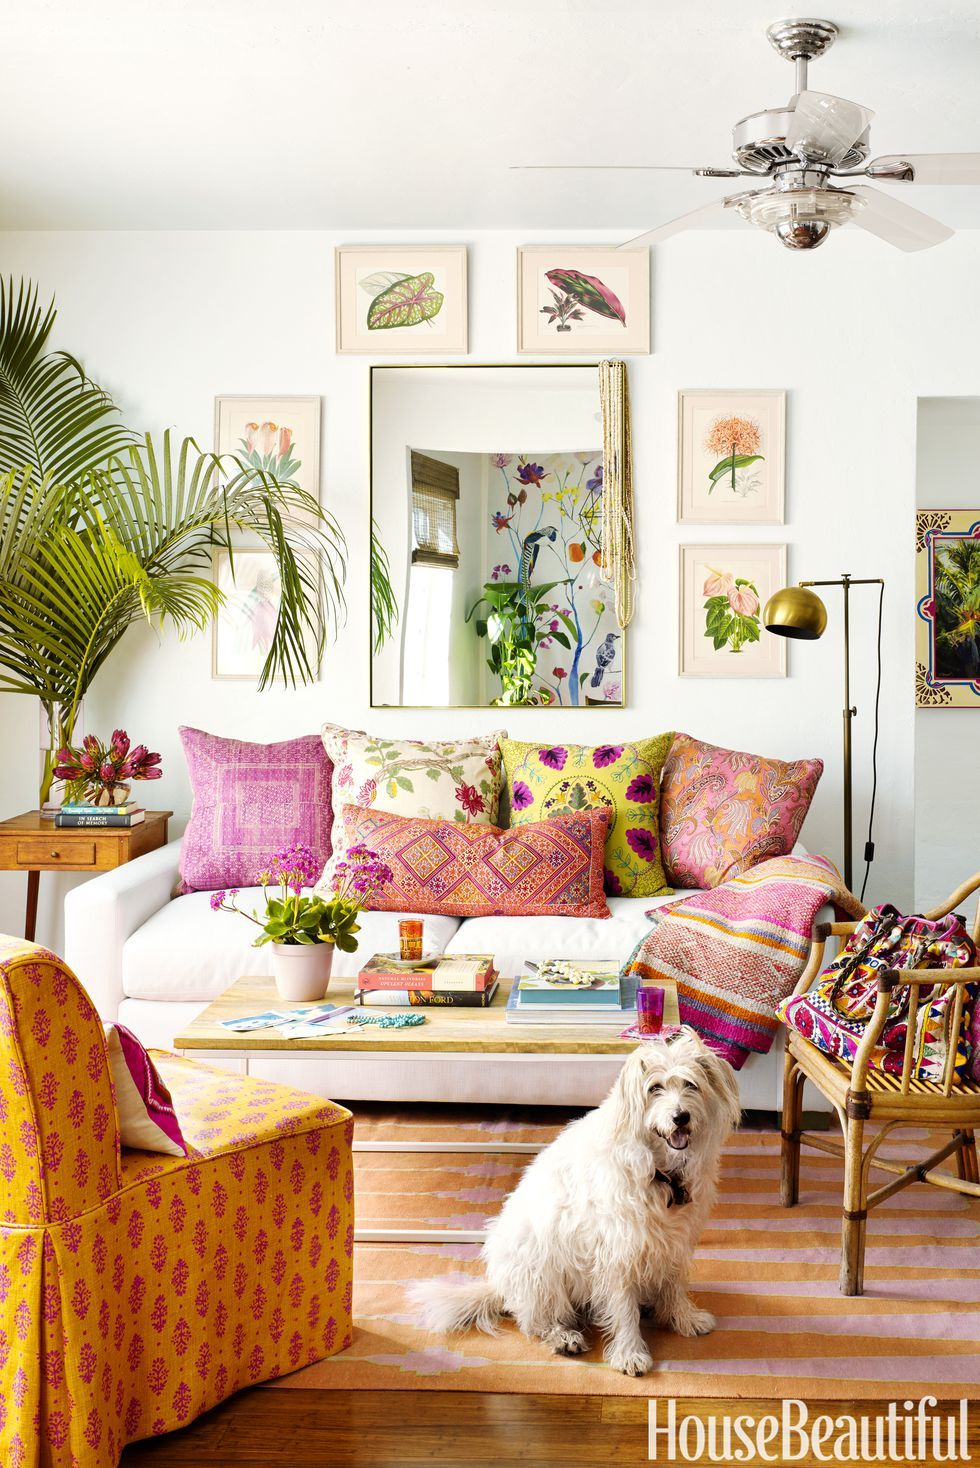 30 Bohemian Room Decor Ideas For The Modern Free Spirit